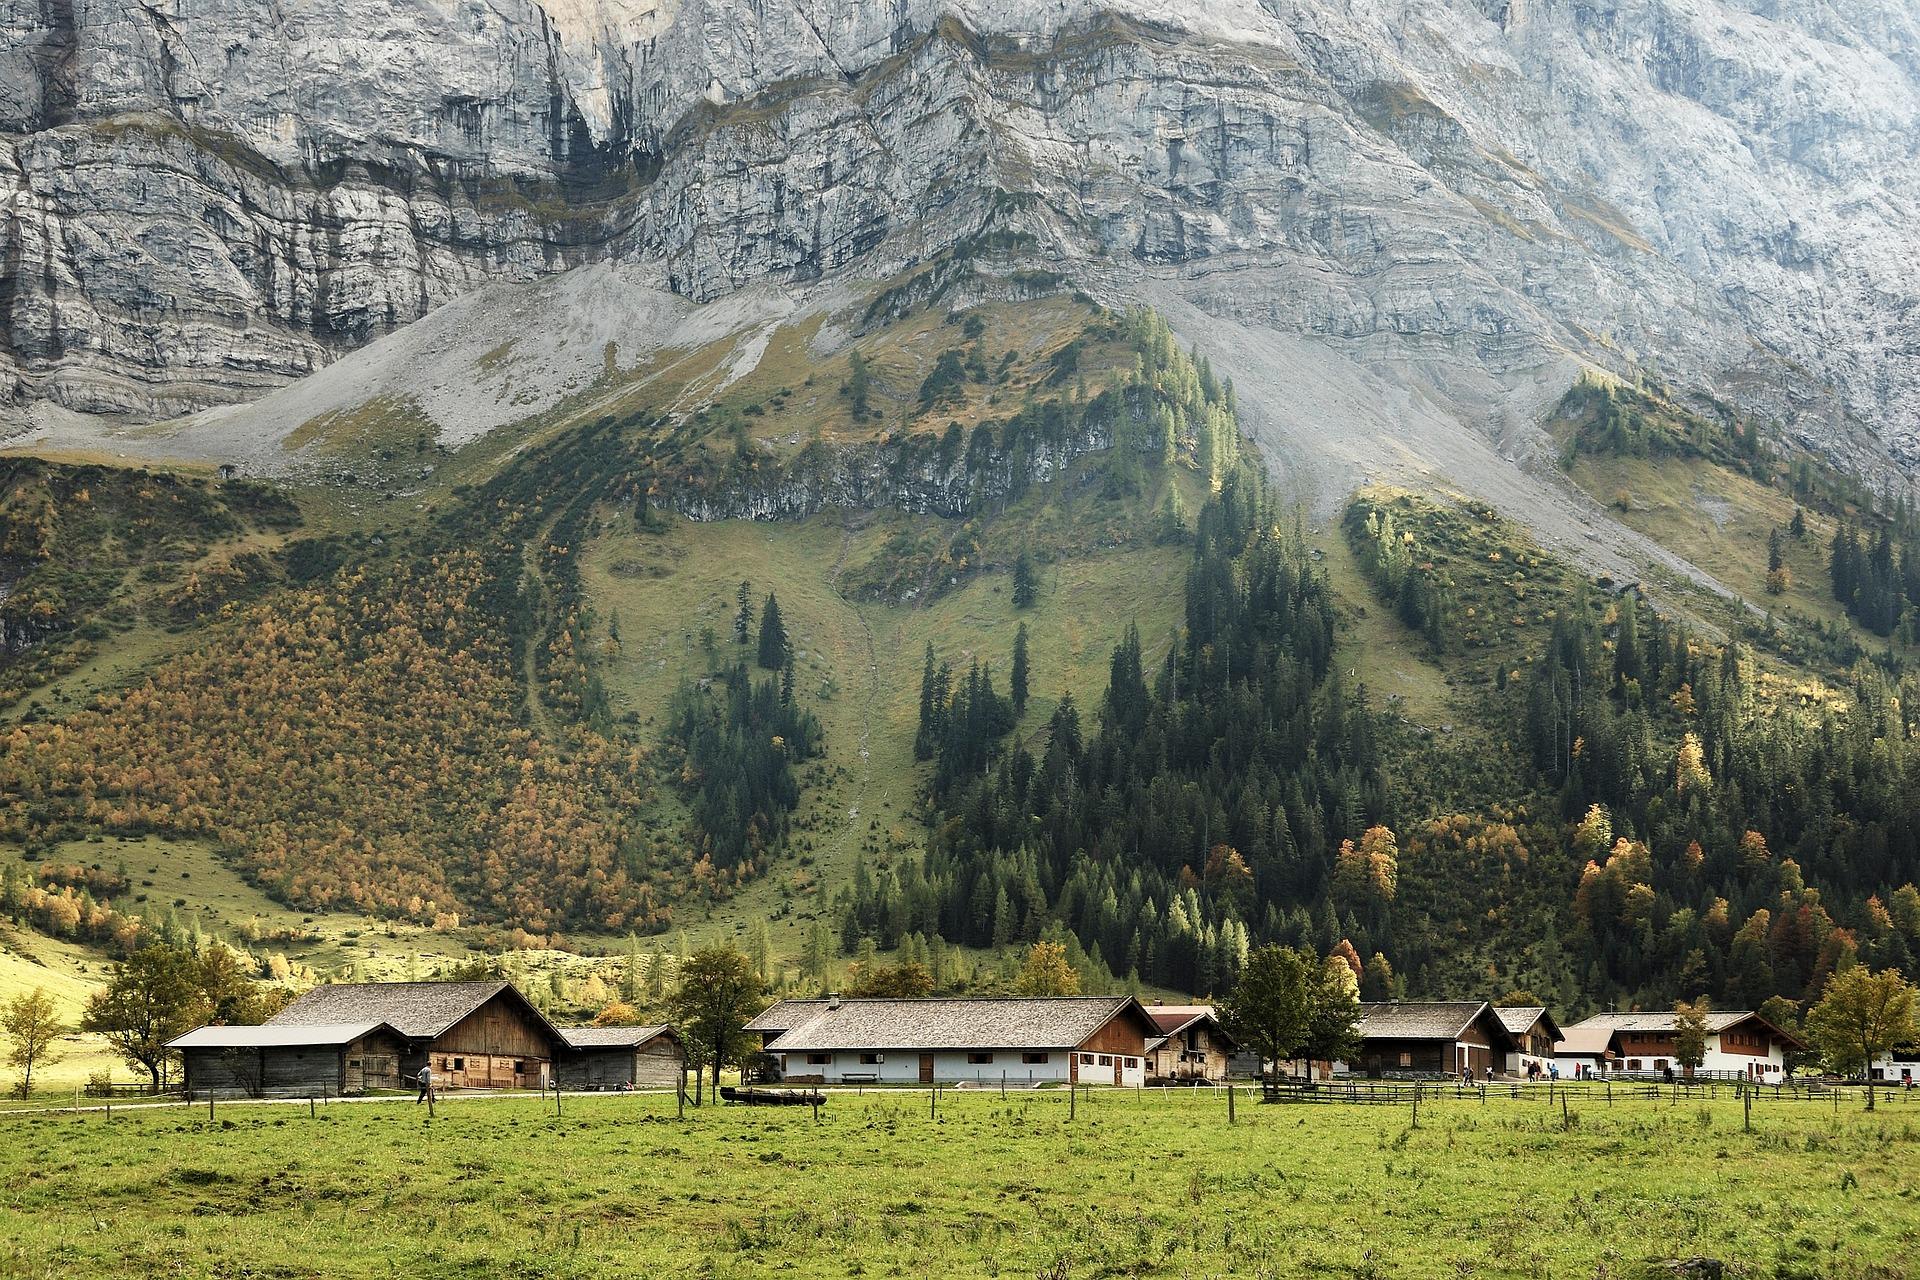 austria-1336707_1920.jpg